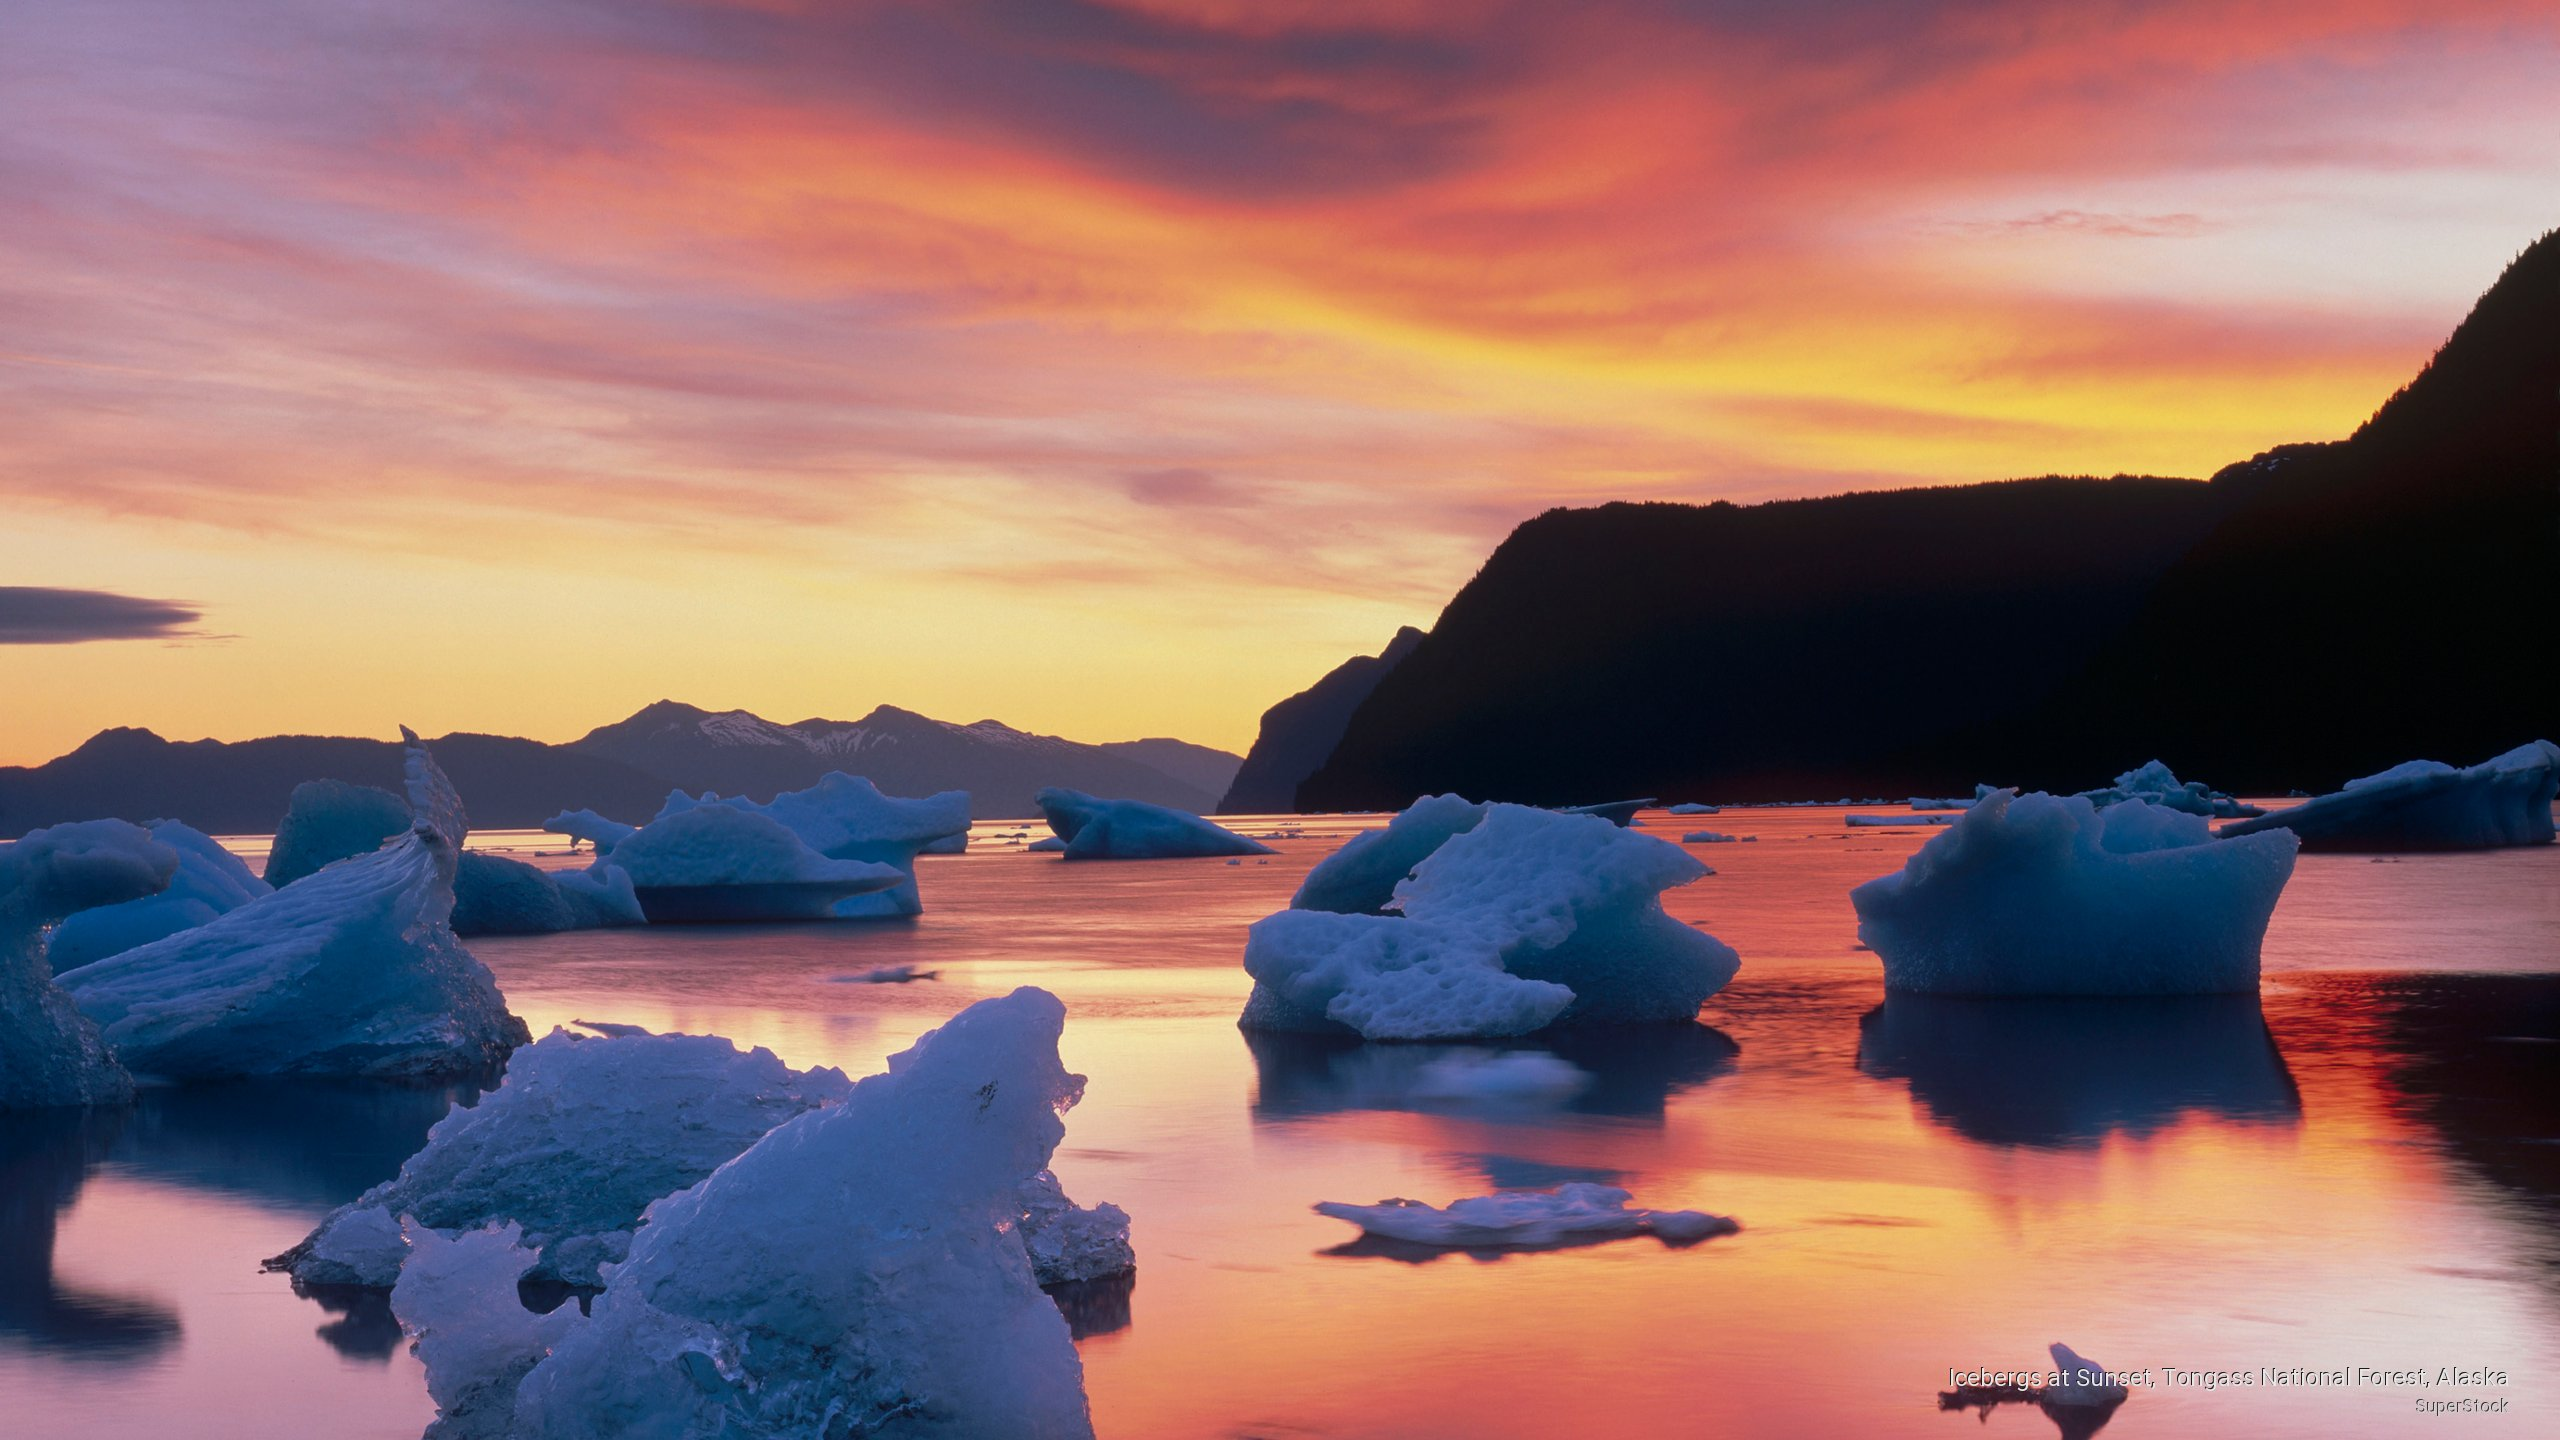 Icebergs at Sunset, Tongass National Forest, Alaska